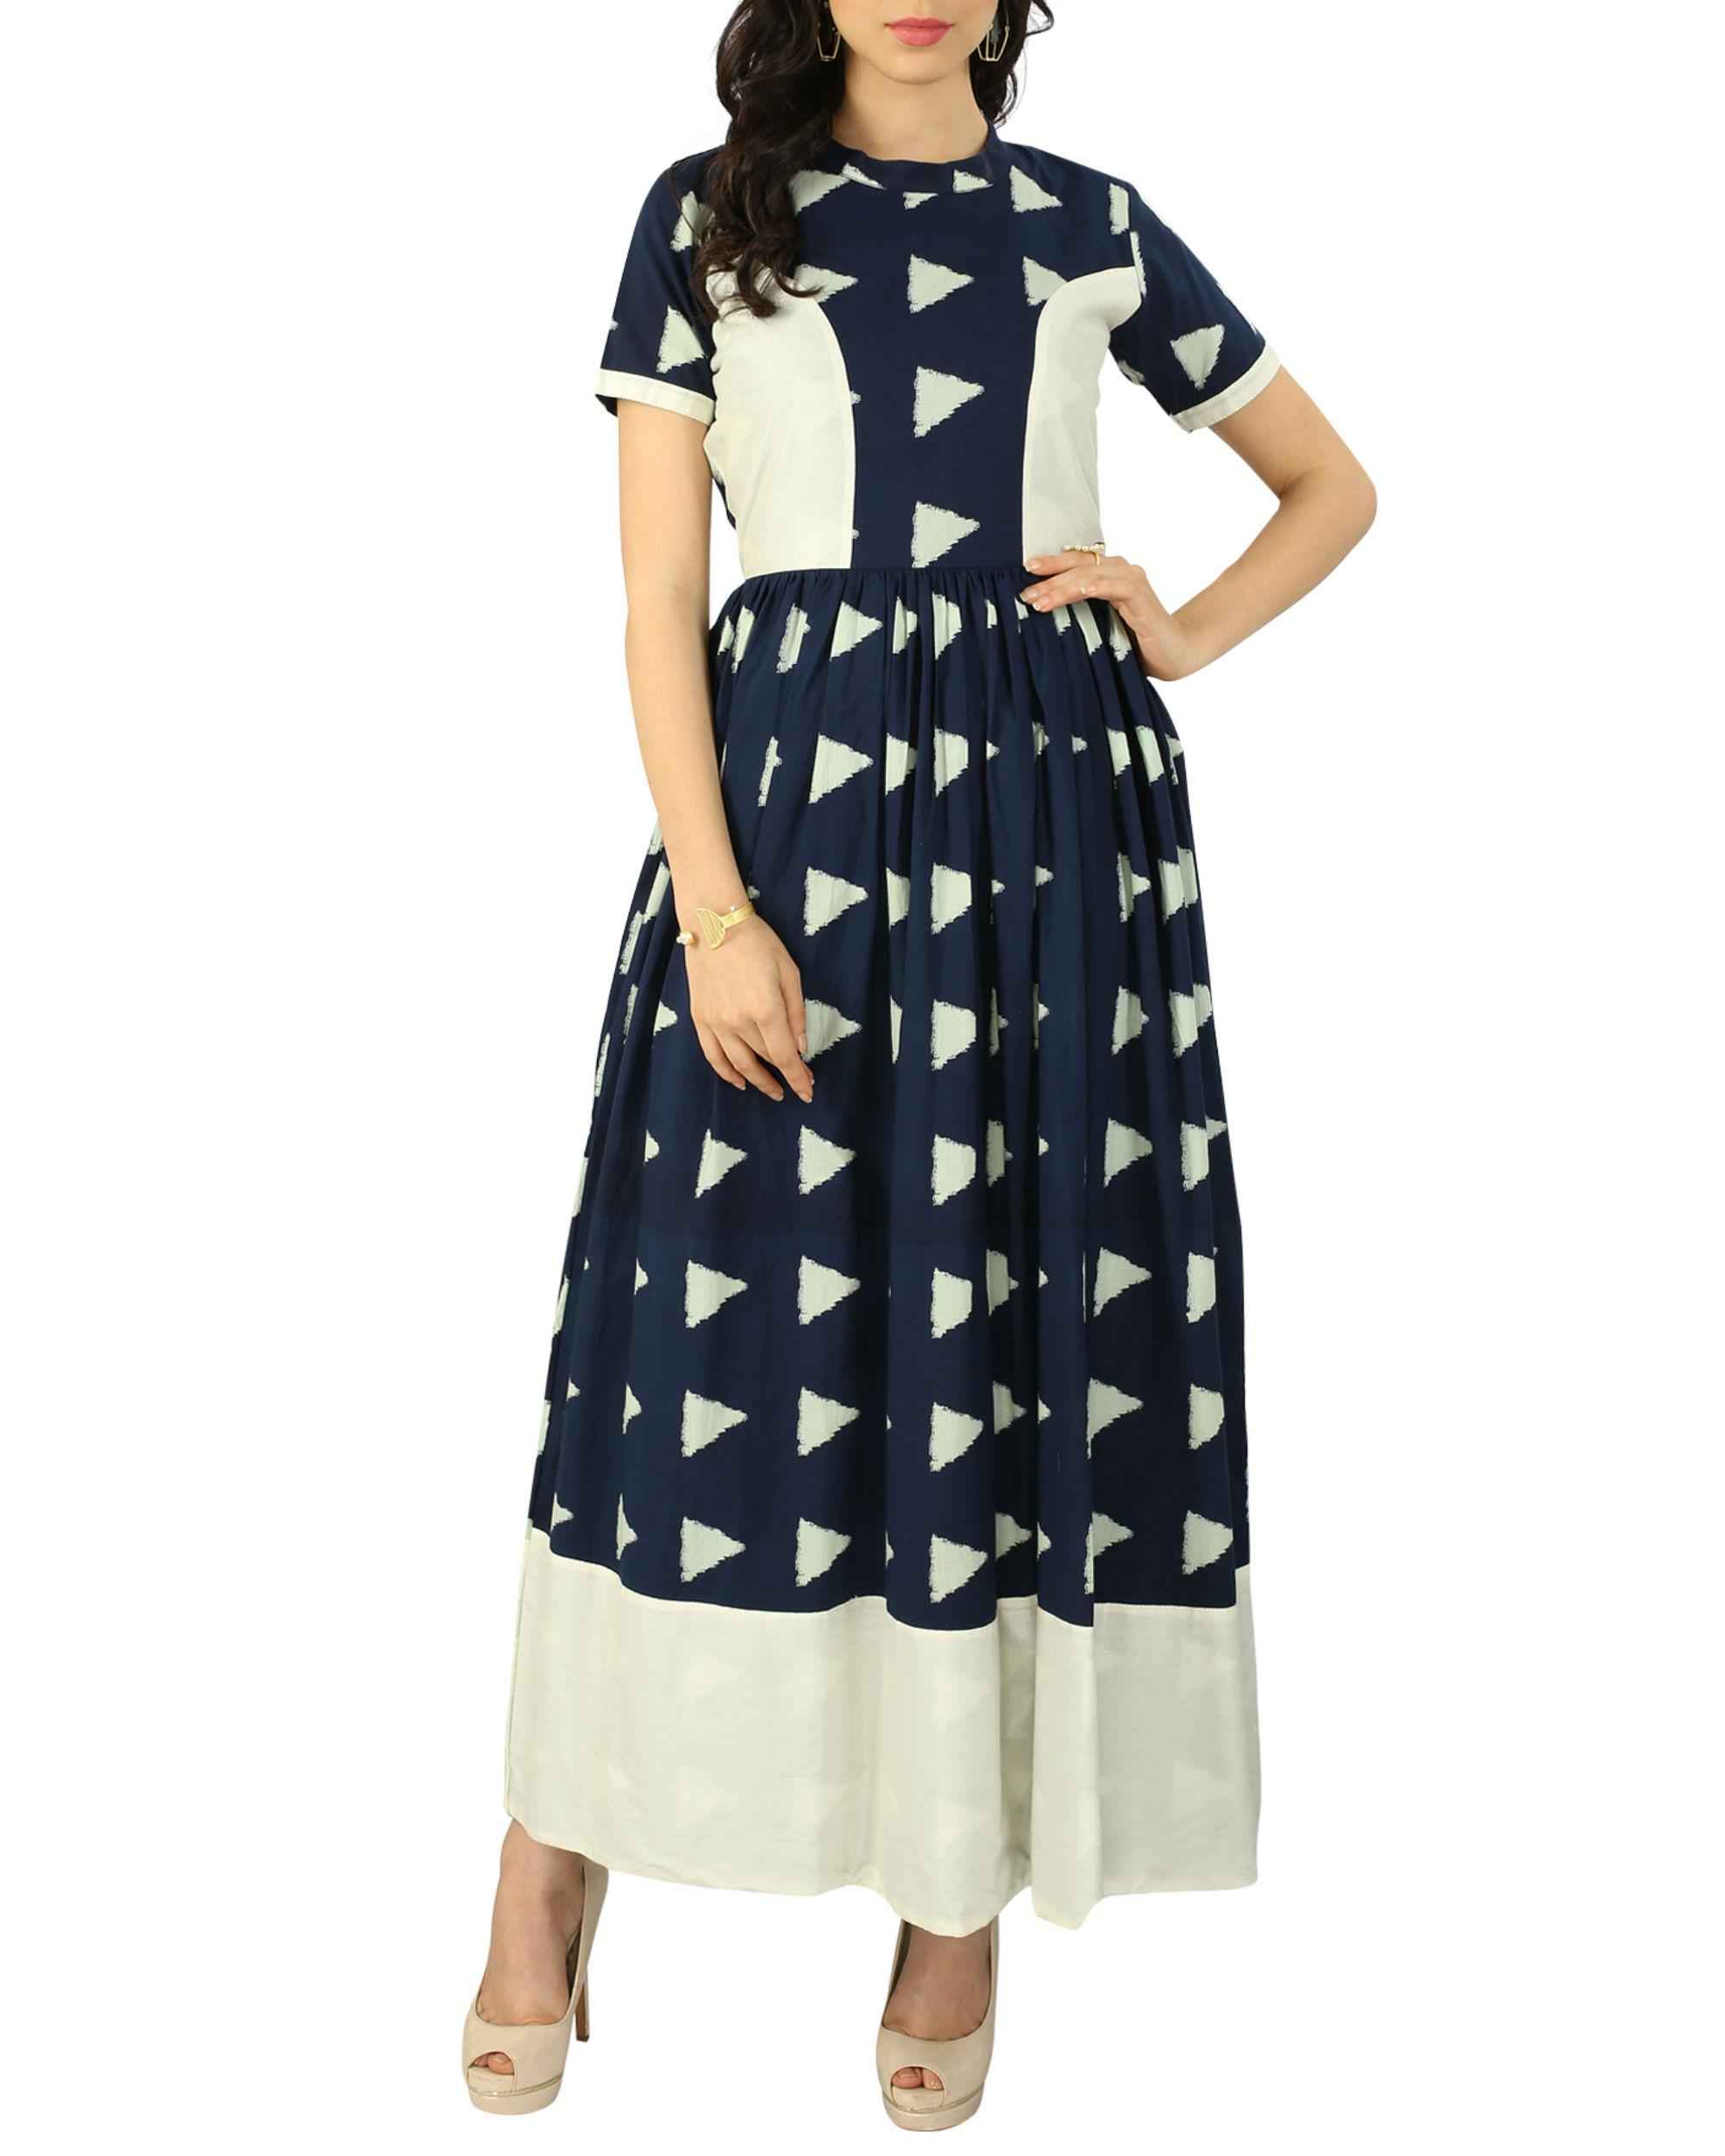 Navy block dress